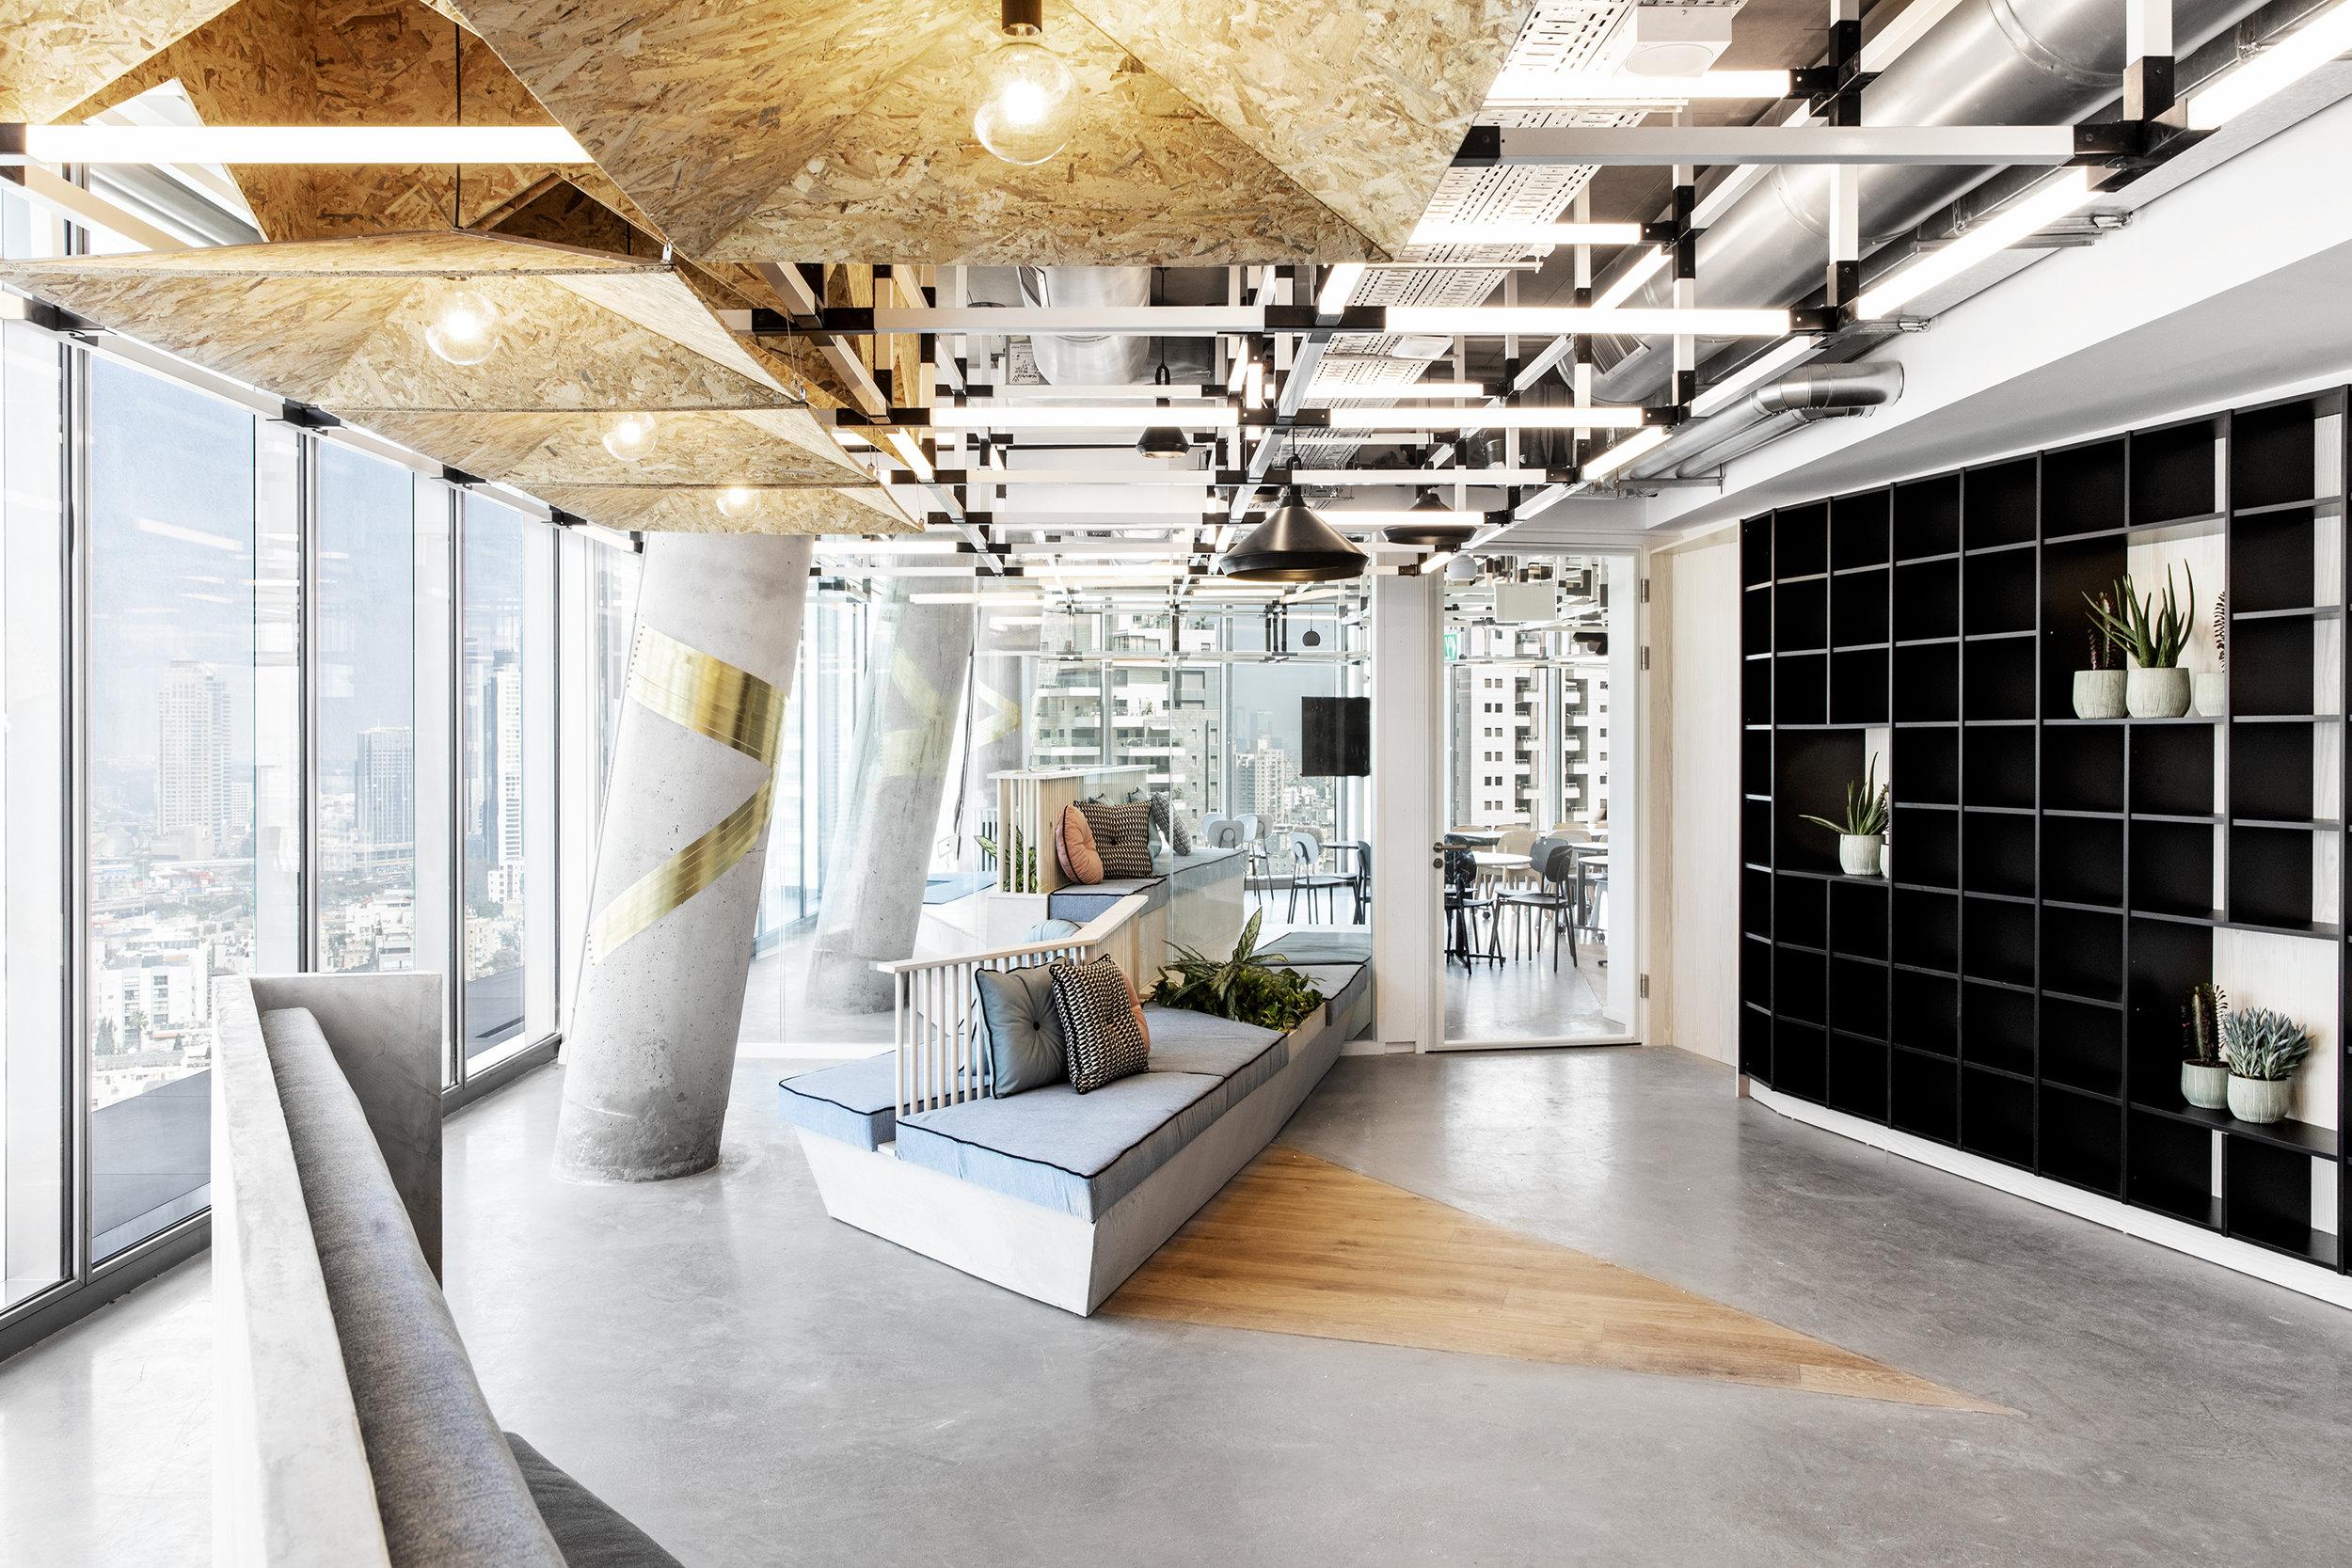 רואי דוד אדריכלות - אדריכל - נטורל אינטליג'נס - ROY DAVID - ARCHITECTURE - ARCHITECT - NI (40).jpg